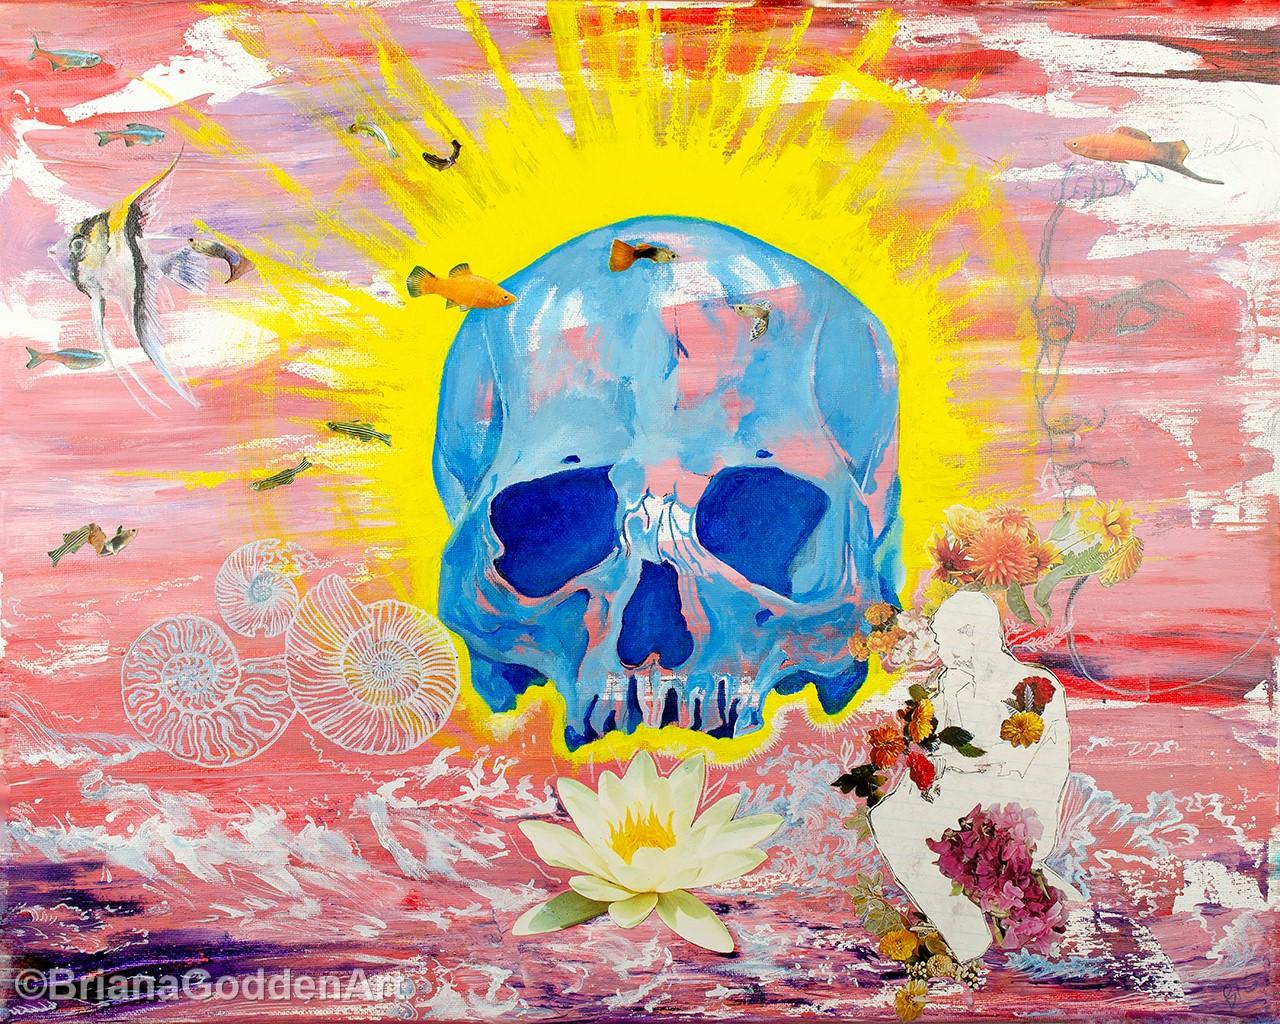 Blue Skull Surrounded by Dreams by Briana Godden, acrylic, 20